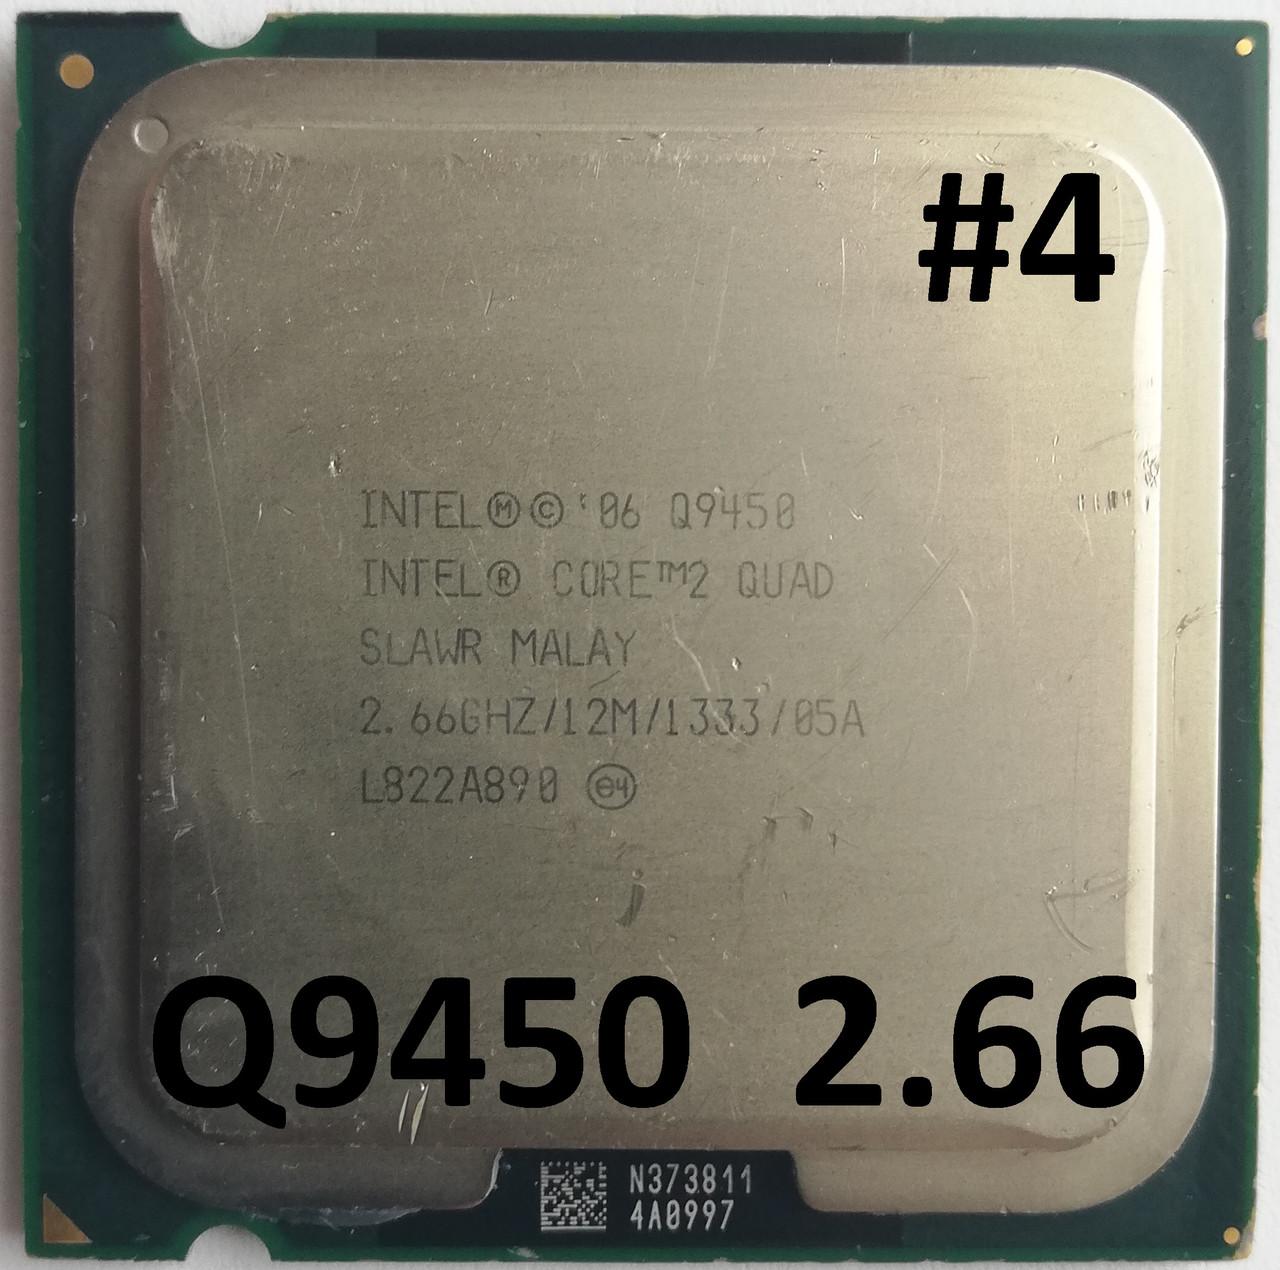 Процессор ЛОТ #4 Intel® Core™2 Quad Q9450 SLAWR 2.66GHz 12M Cache 1333 MHz FSB Soket 775 Б/У